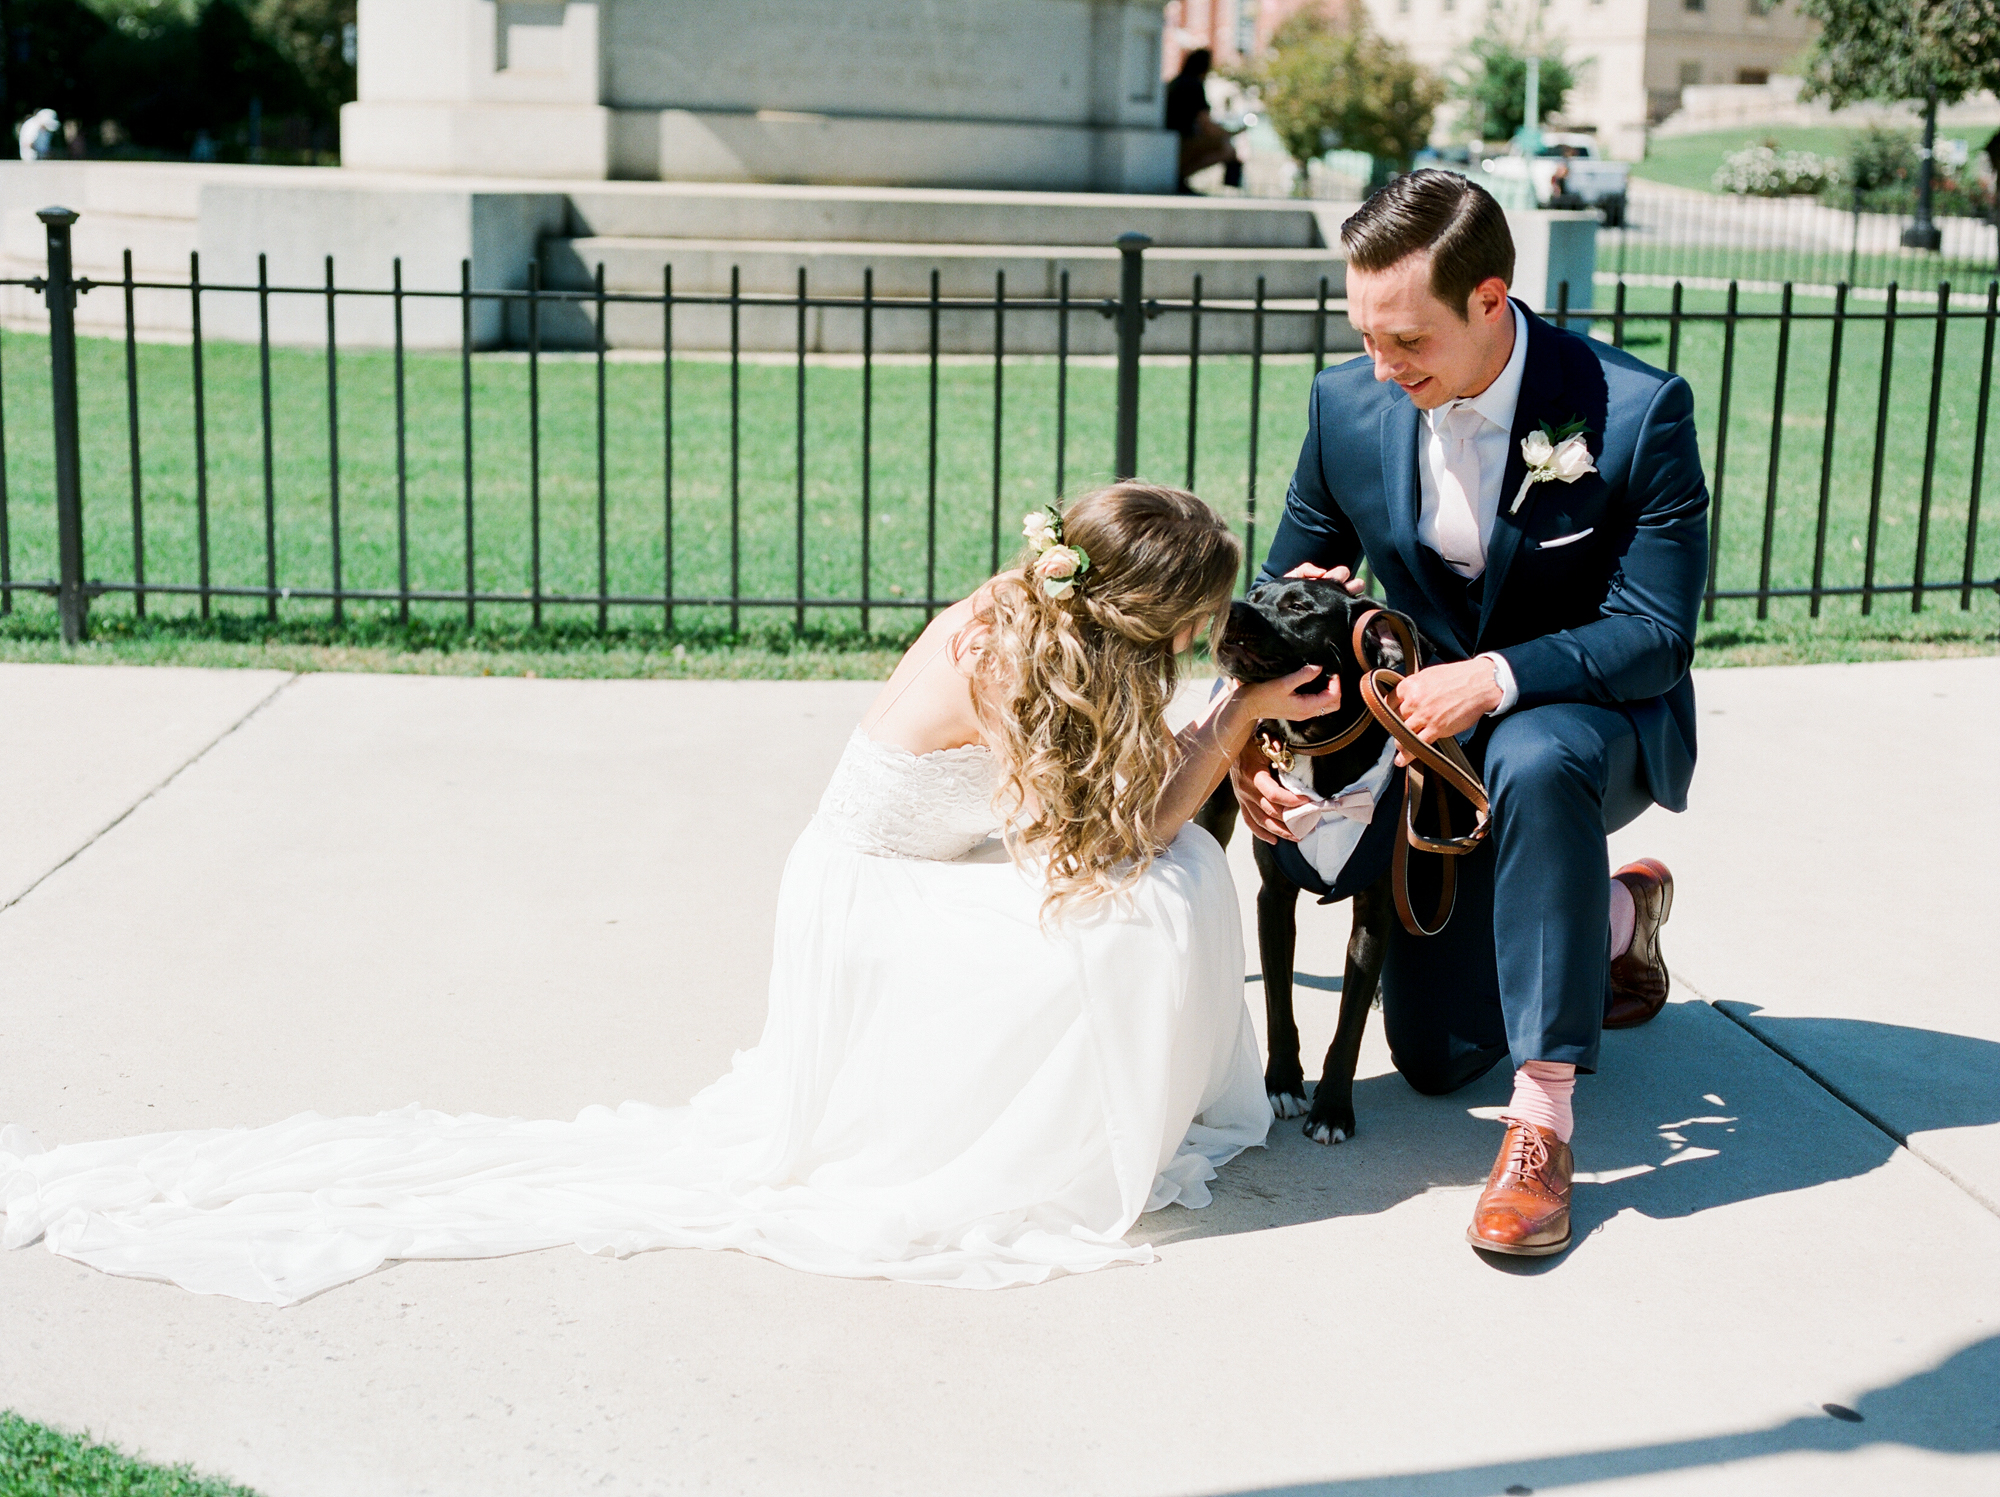 LongView-Gallery-Wedding-Art-Washington-DC-Film-Photographer-10.jpg